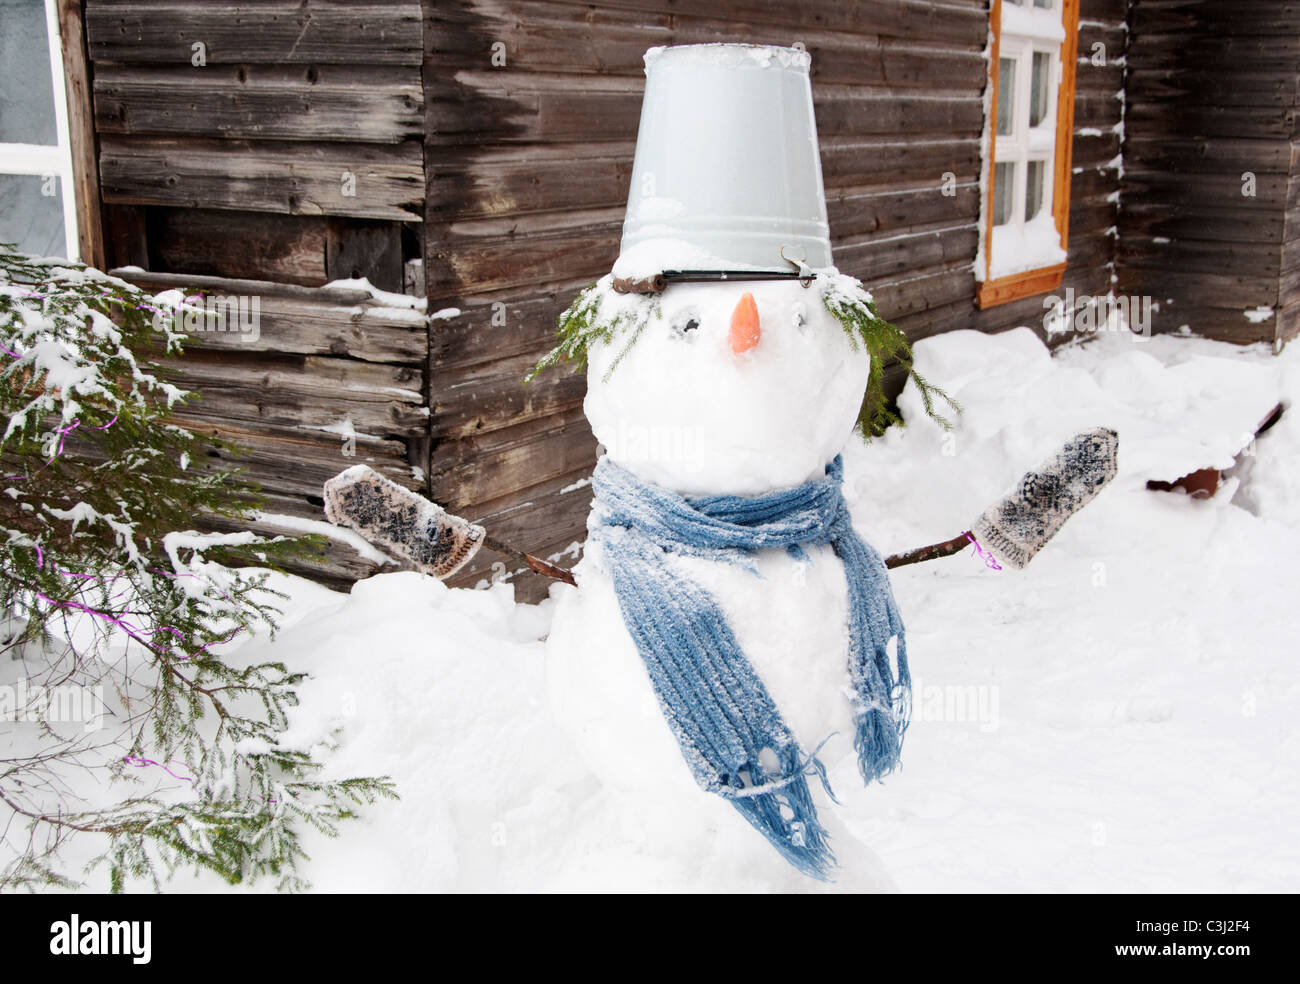 Snowman, Leningrad region, Russia - Stock Image